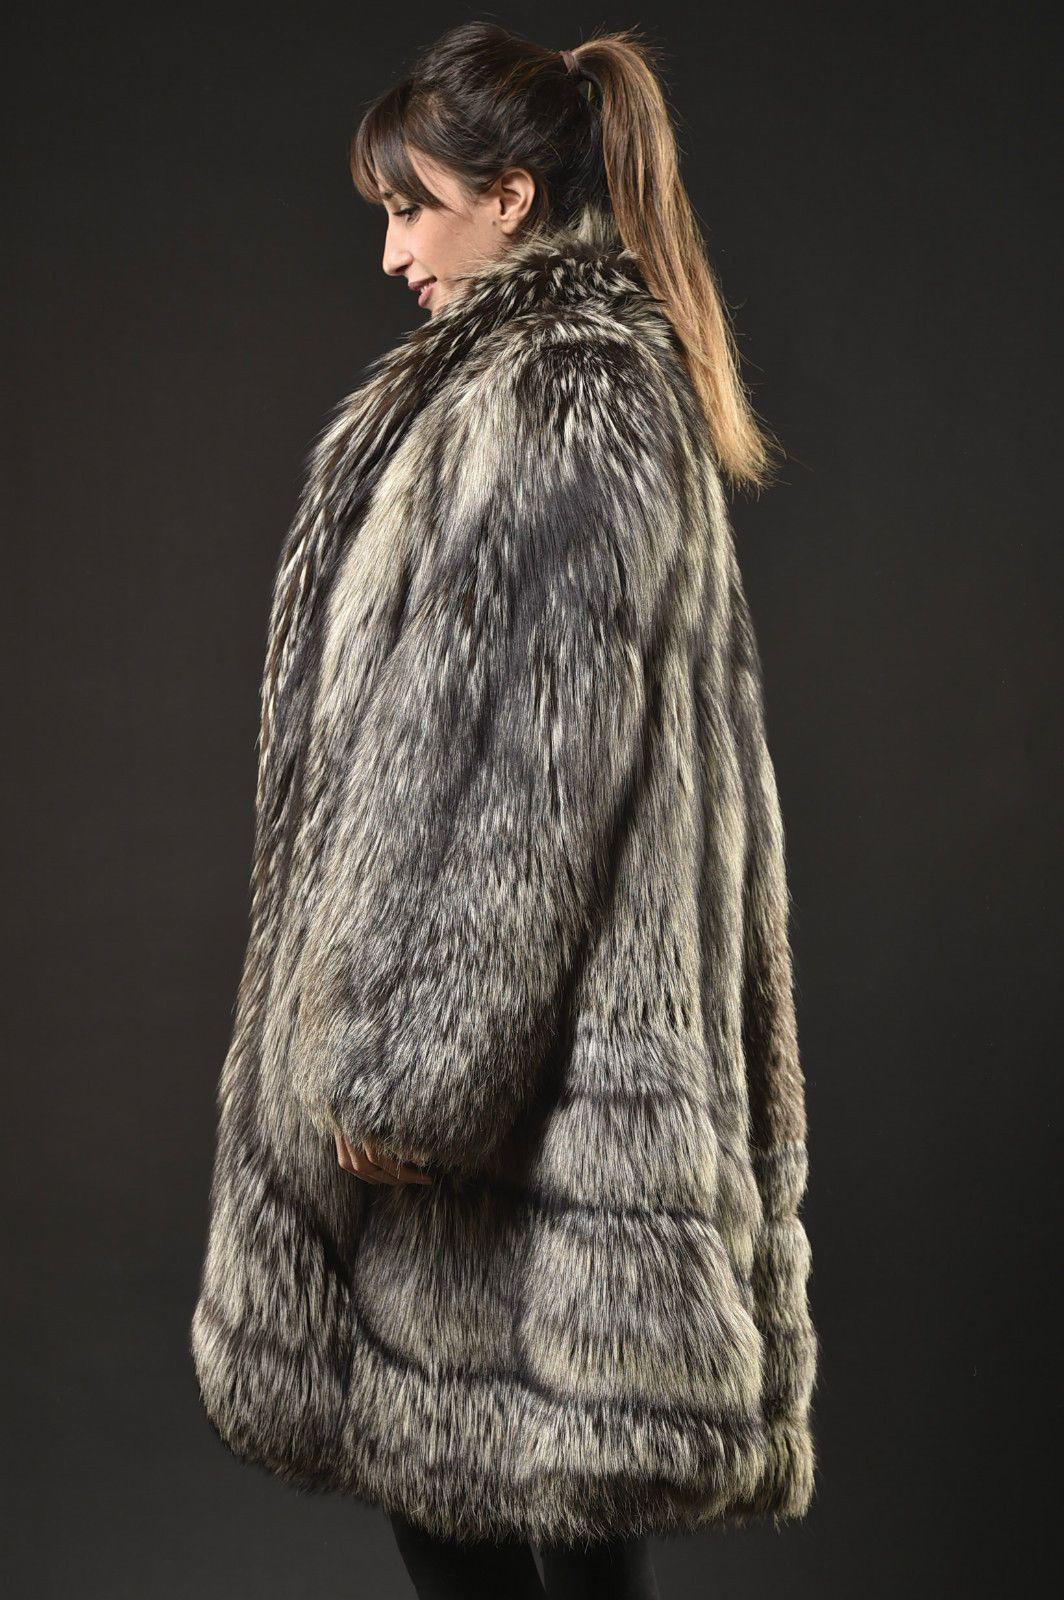 silver fox fur coat manteau pelisse fourrure renard argent pelliccia volpe ebay fur66. Black Bedroom Furniture Sets. Home Design Ideas